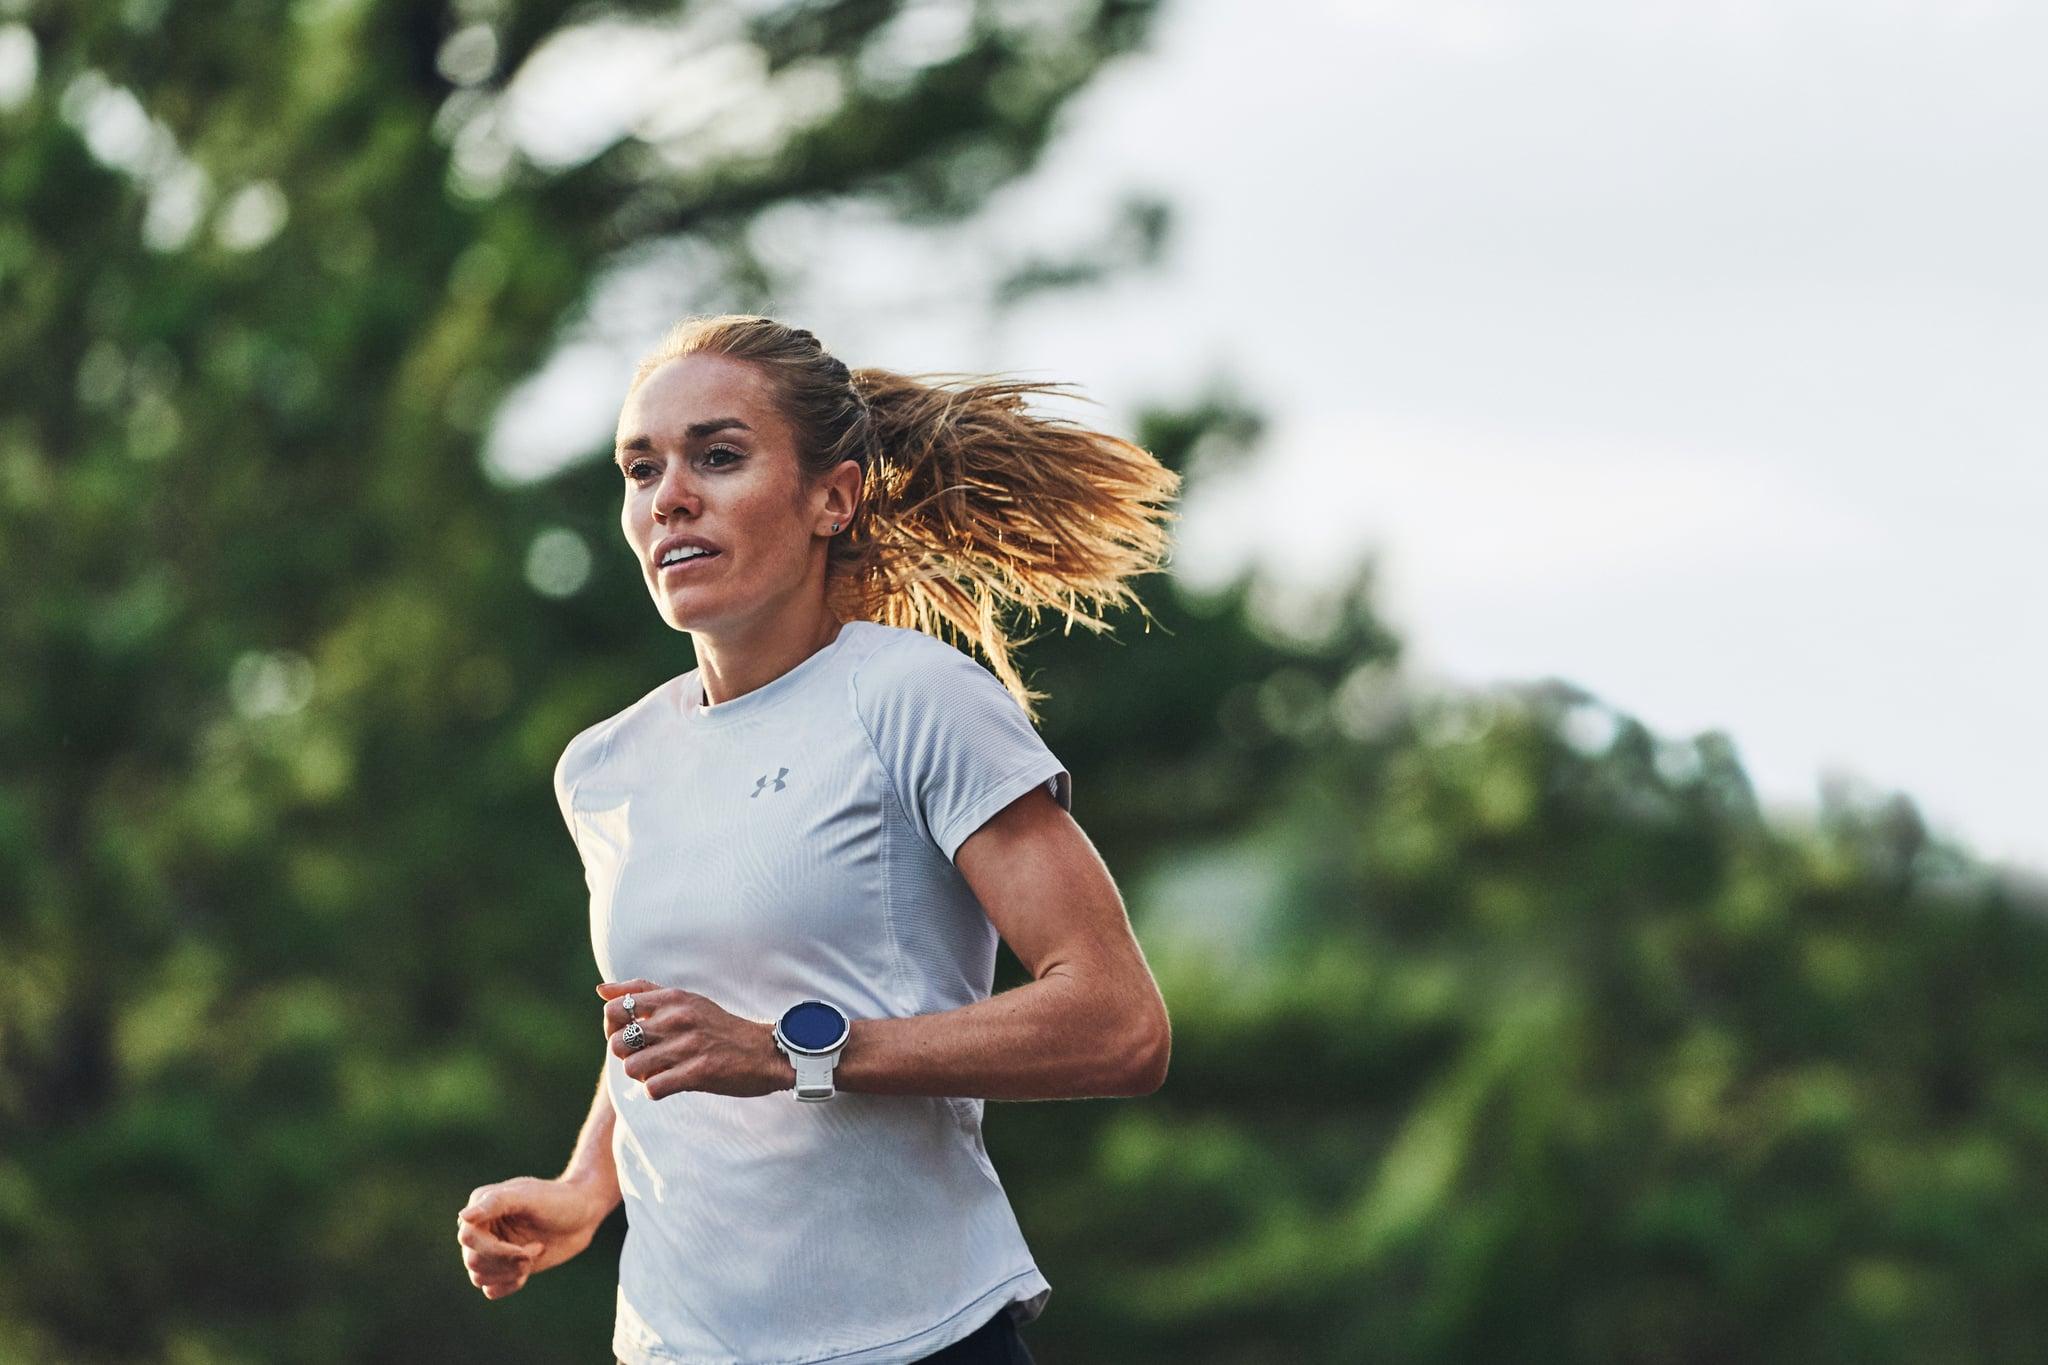 benefits of non-fitness goals